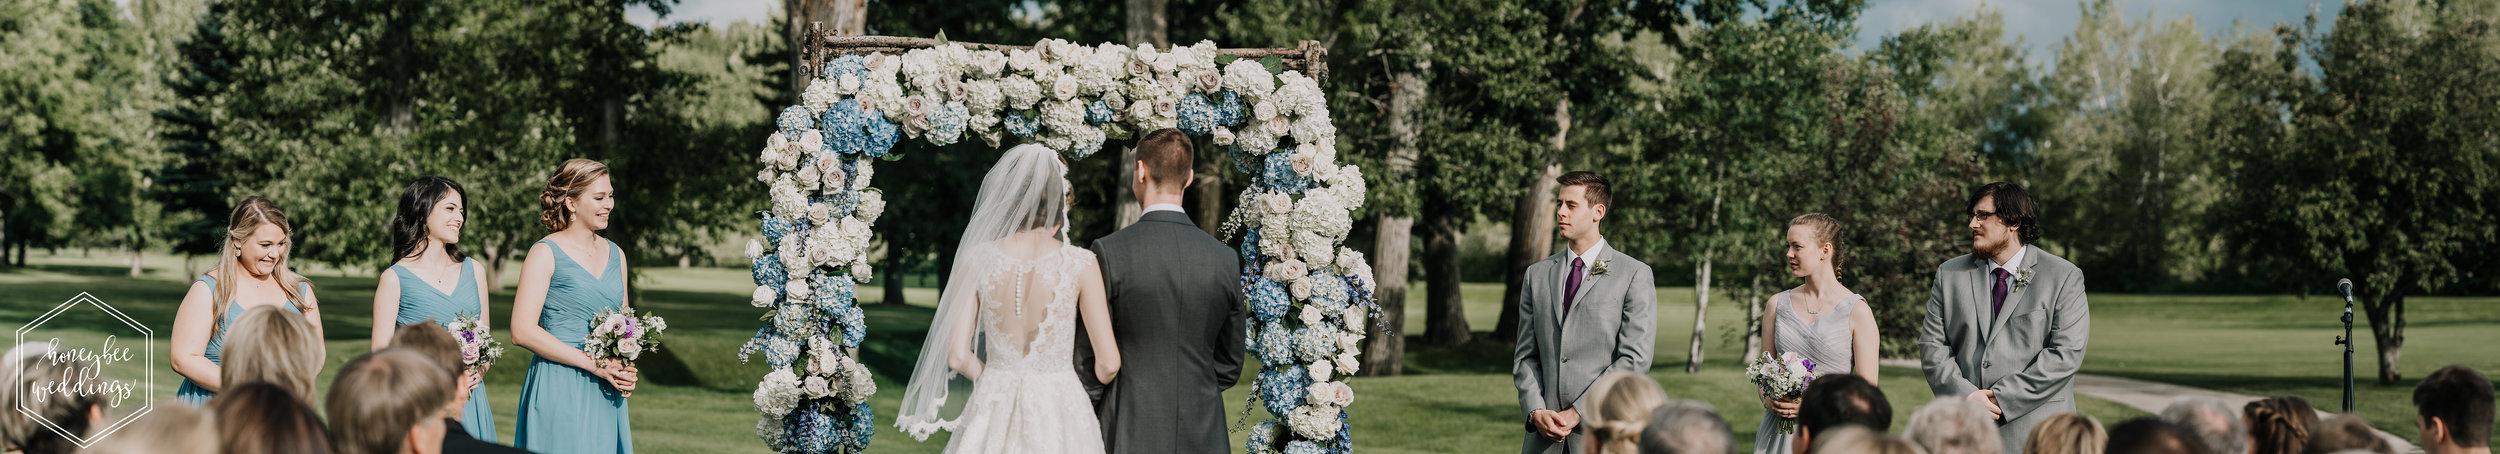 976 Riverside Country Club Wedding_Montana Wedding Photographer_Lauren Jackson + Evan Ivaldi 2018-6650-Pano_small.jpg